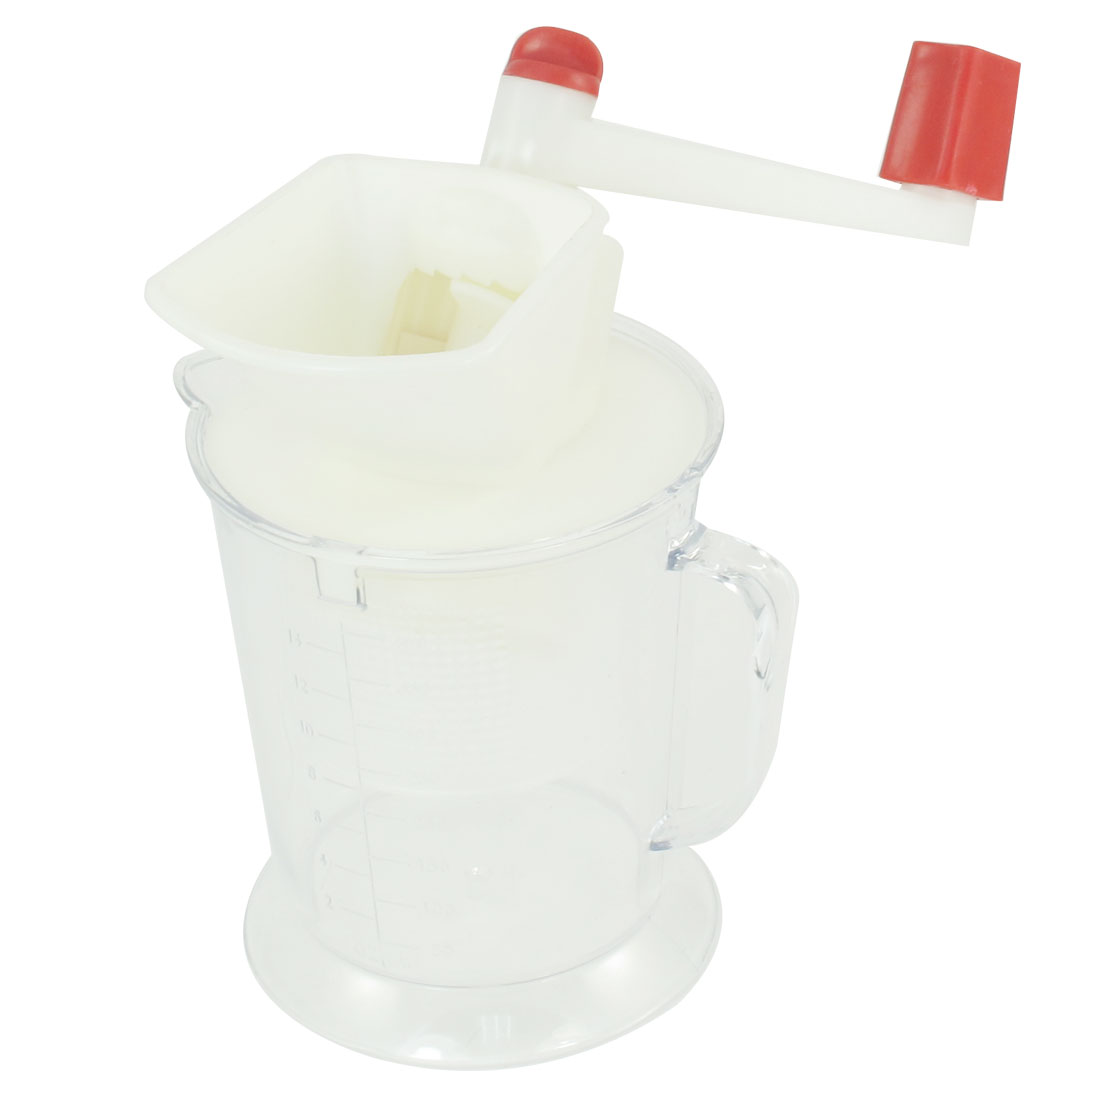 Portable Clear Plastic Bowl 400ml Capacity Meat Citrus Lemon Manual Juicer